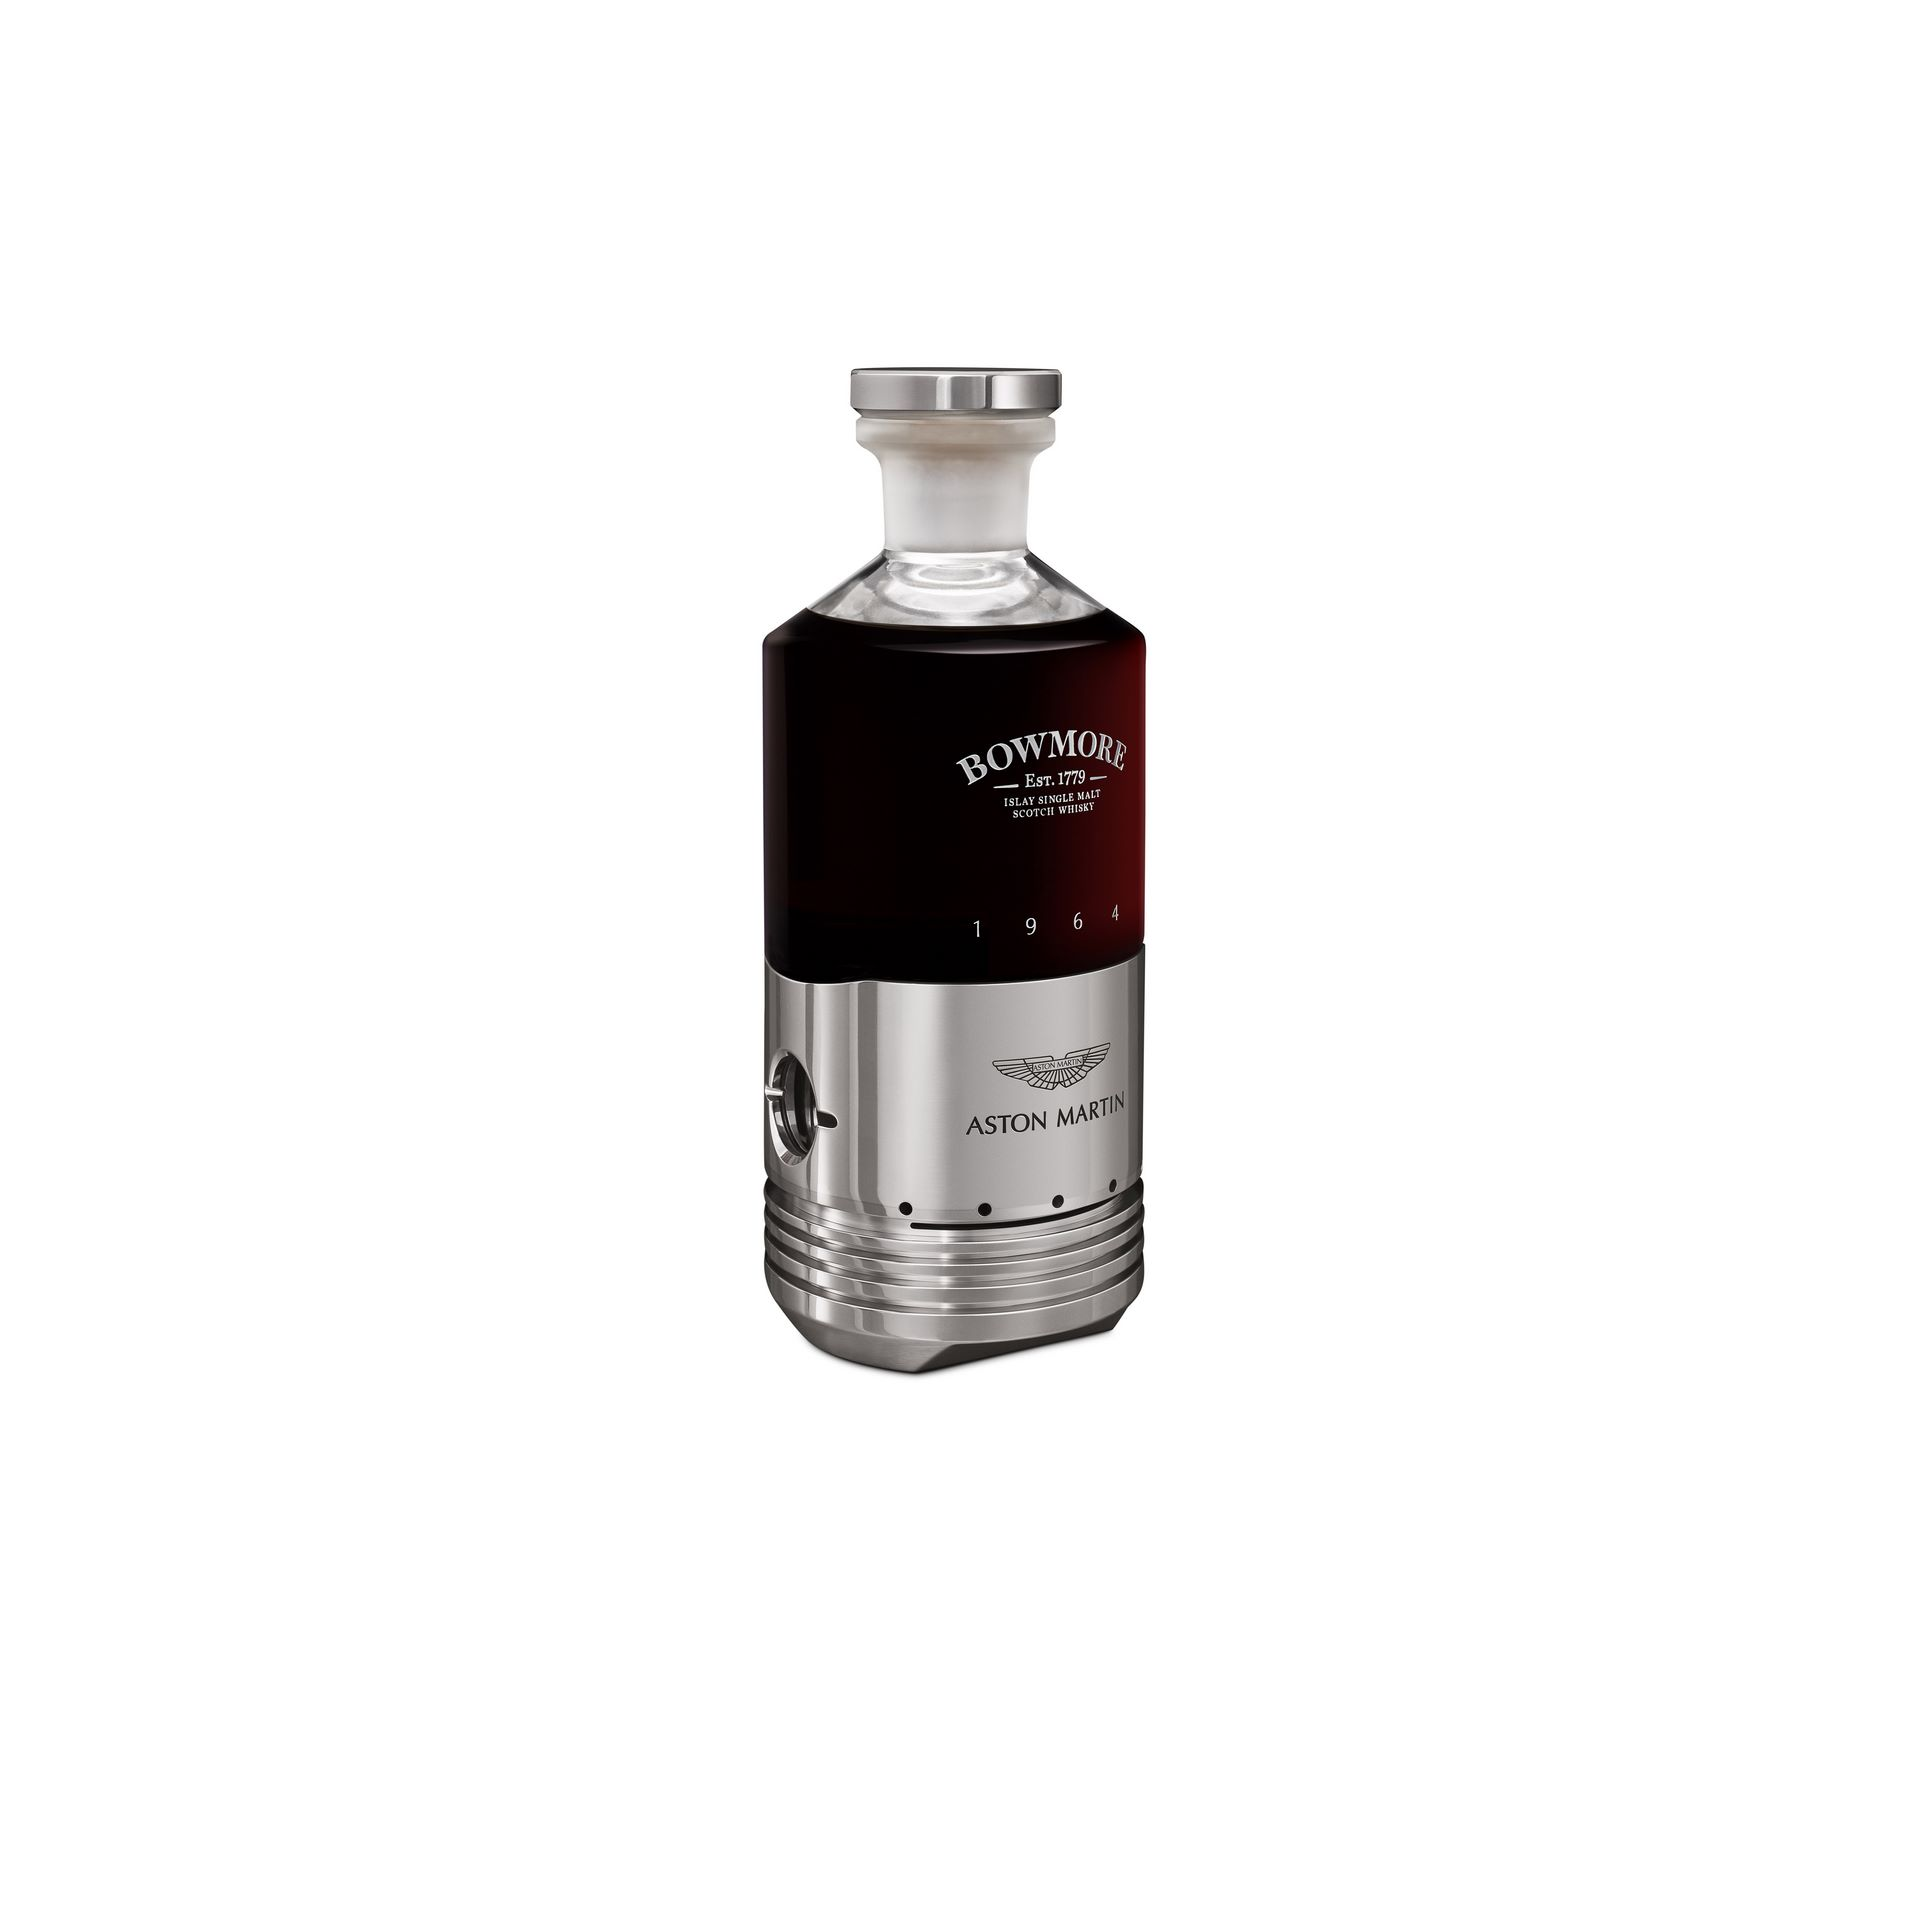 Black-Bowmore-Aston-Martin-DB5-1964-Whisky-6